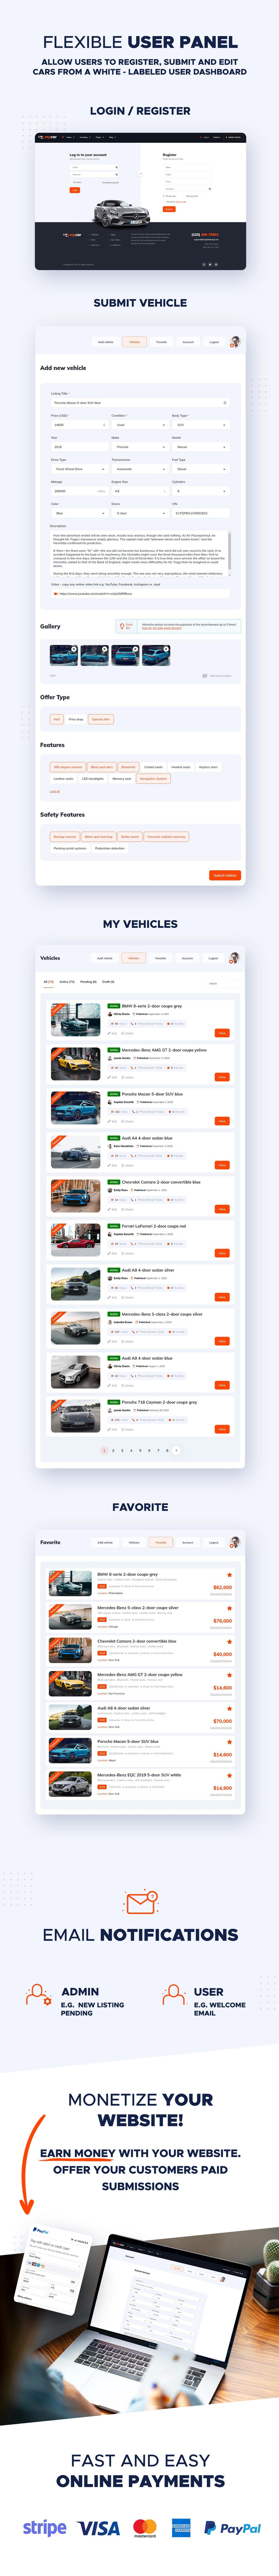 Vehica - Car Dealer & Directory Listing - 10